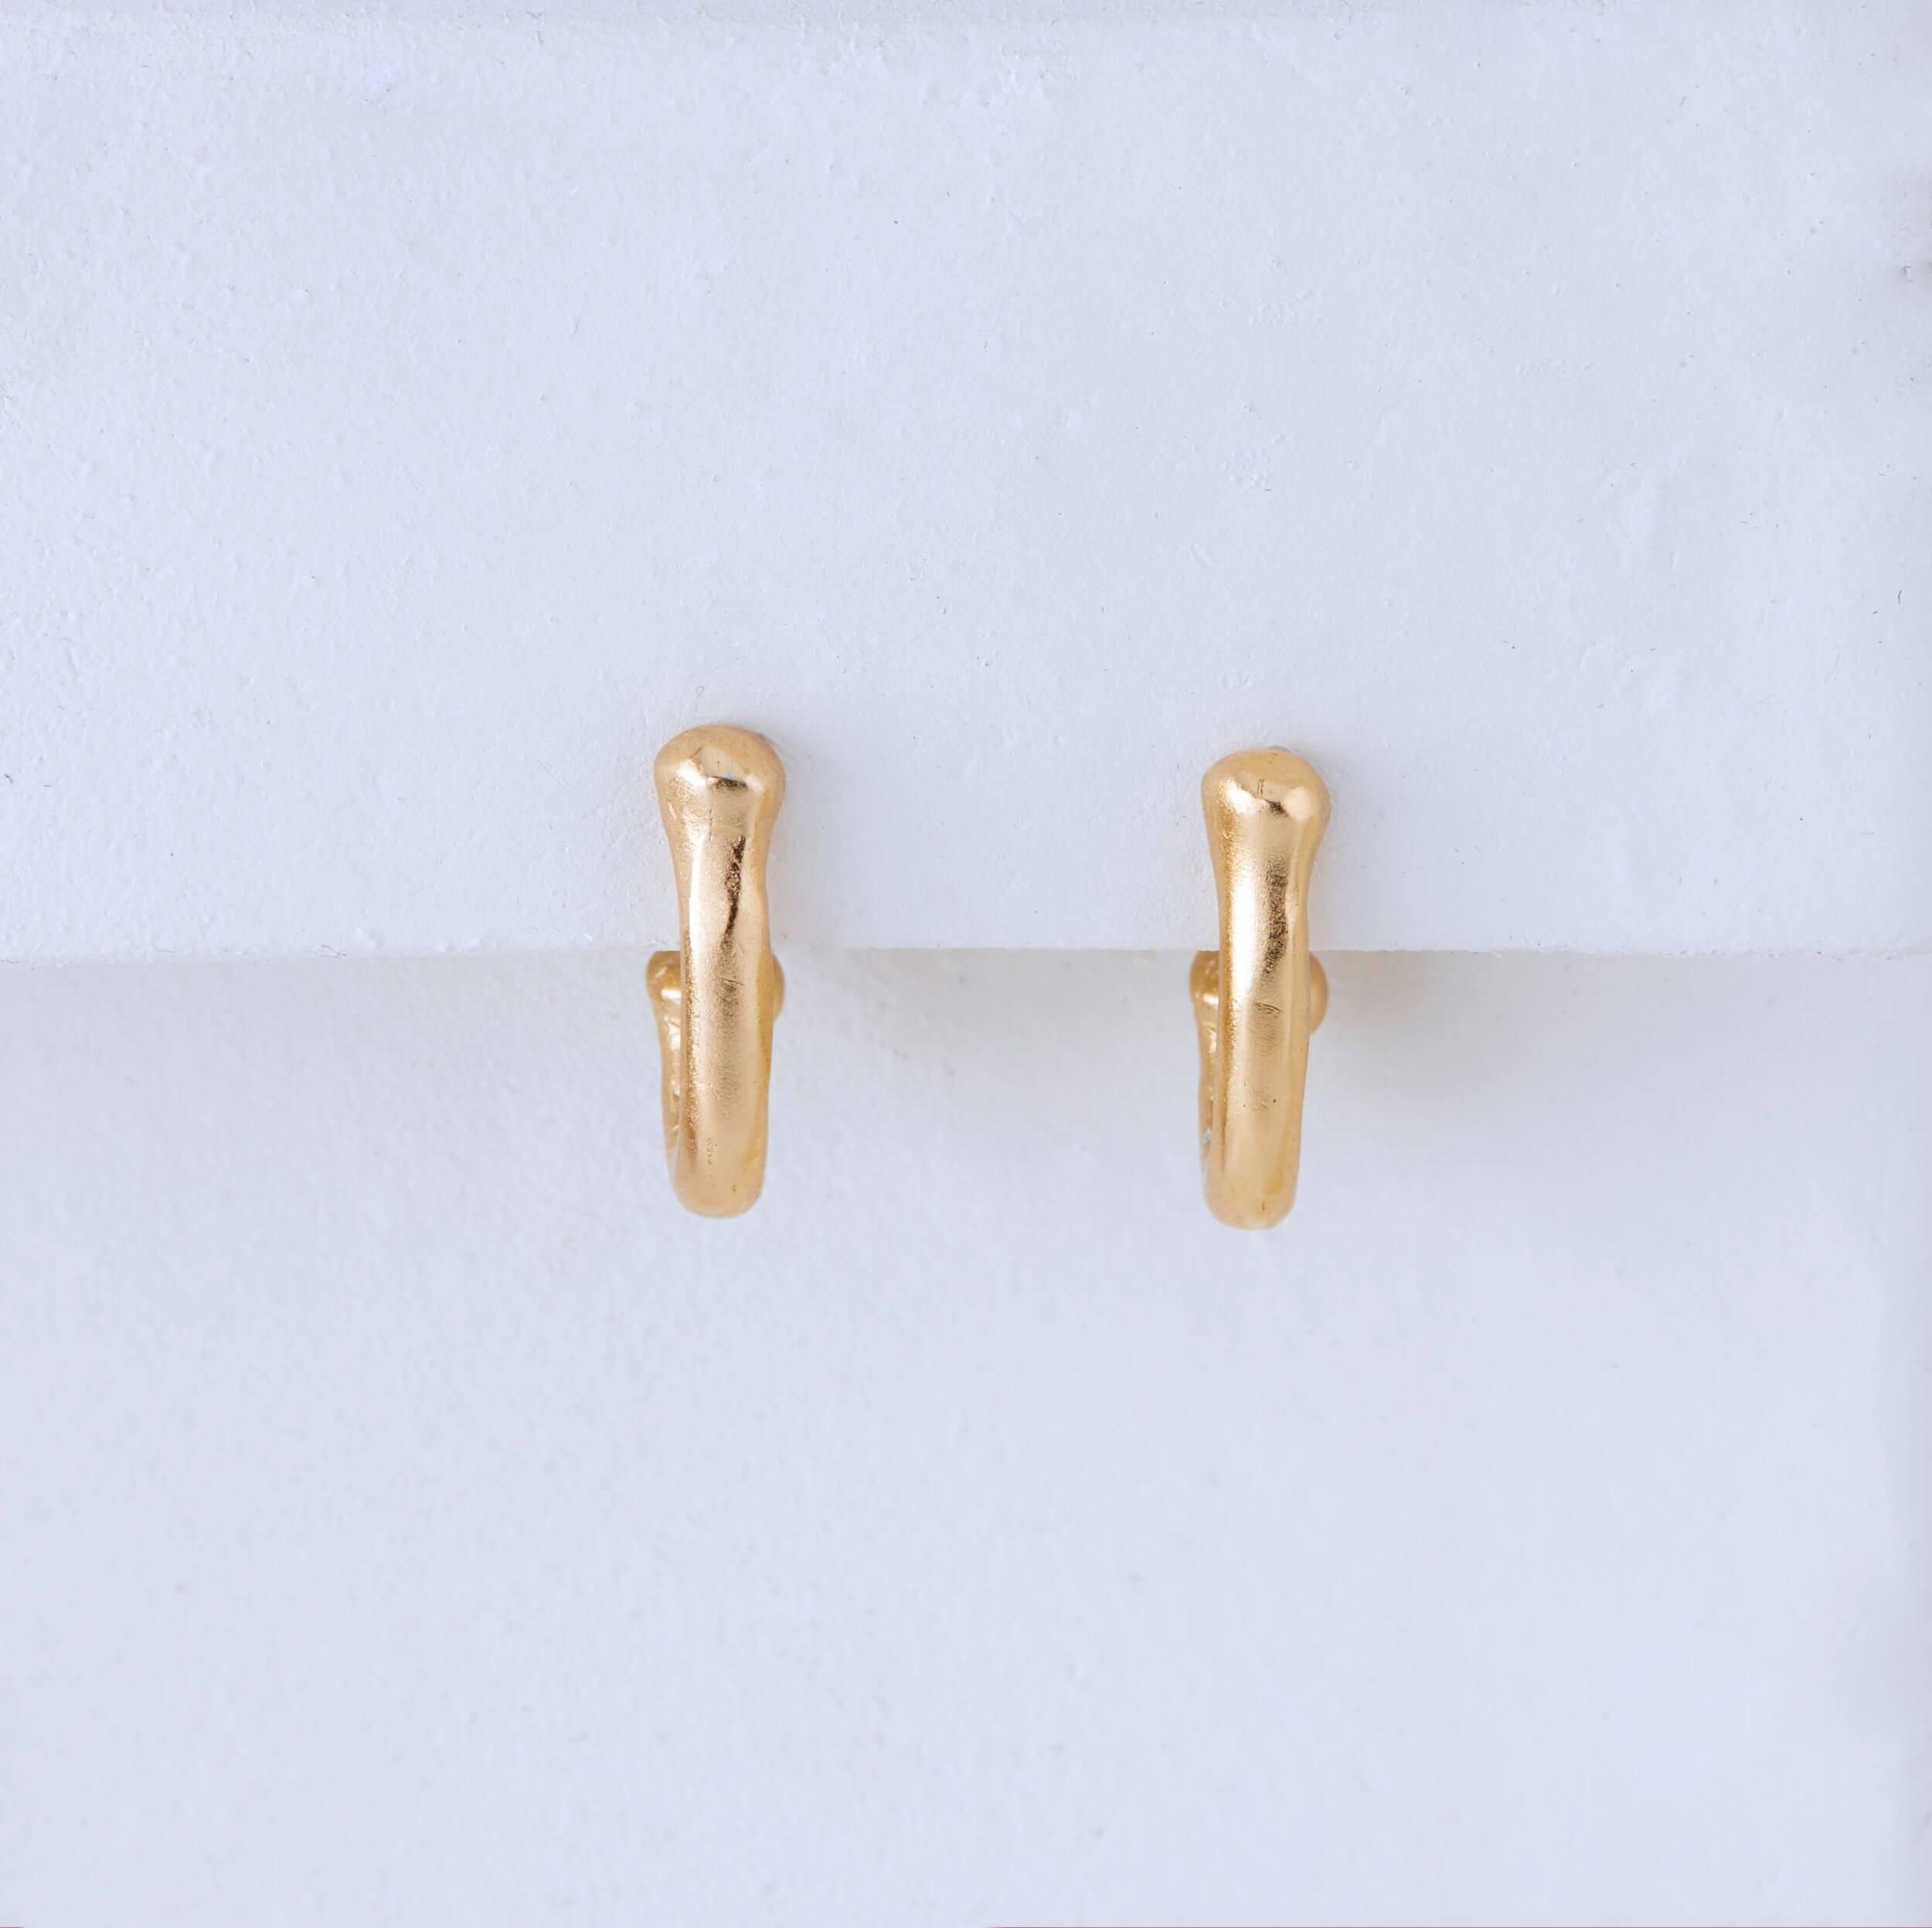 Embrace Earrings - עגילים חובקים כסף מצופה זהב